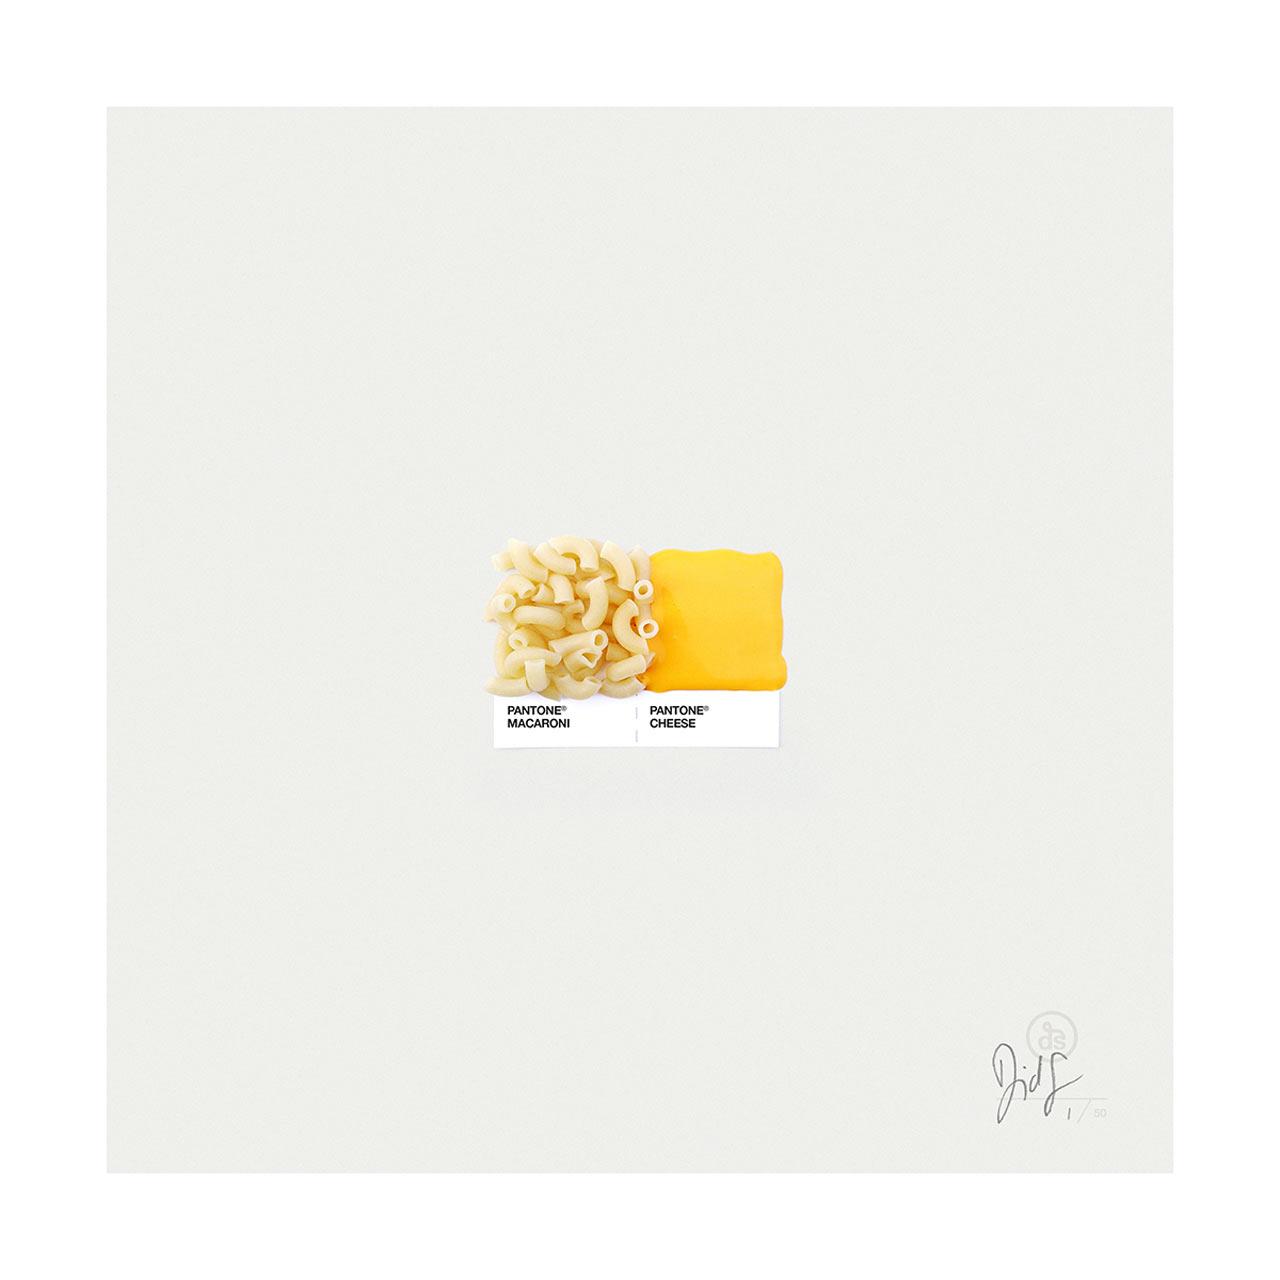 Pantone-Pairings-08_macaroni_cheese